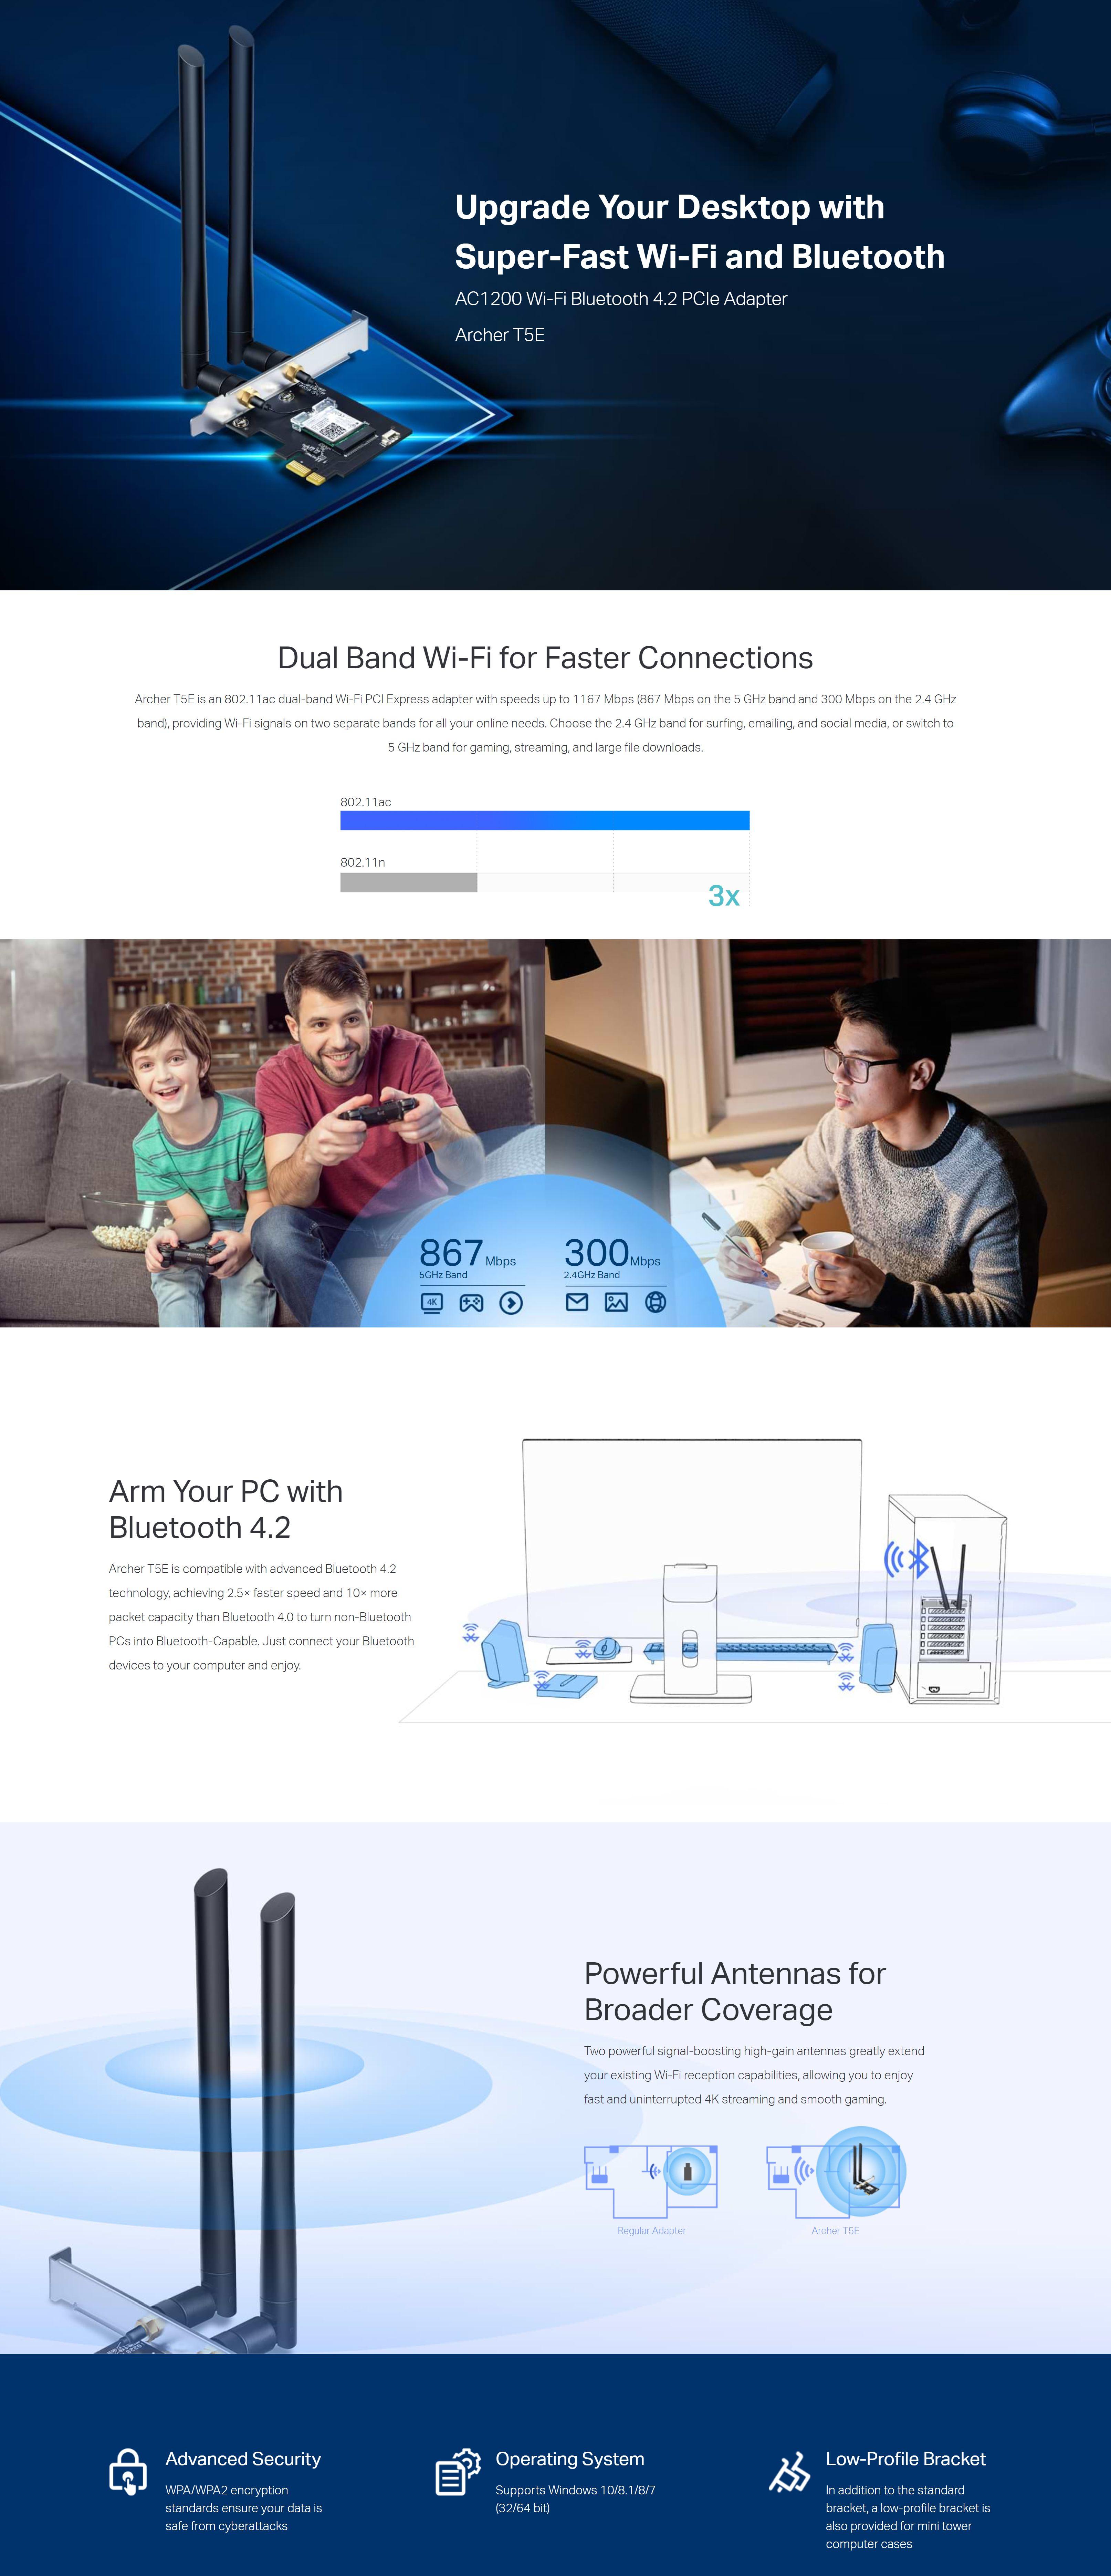 #1620 - 'Archer T5E I AC1200 Wi-Fi Bluetooth 4_2 PCIe Adapter I TP-Link Australia' - www_tp-link_com.jpg